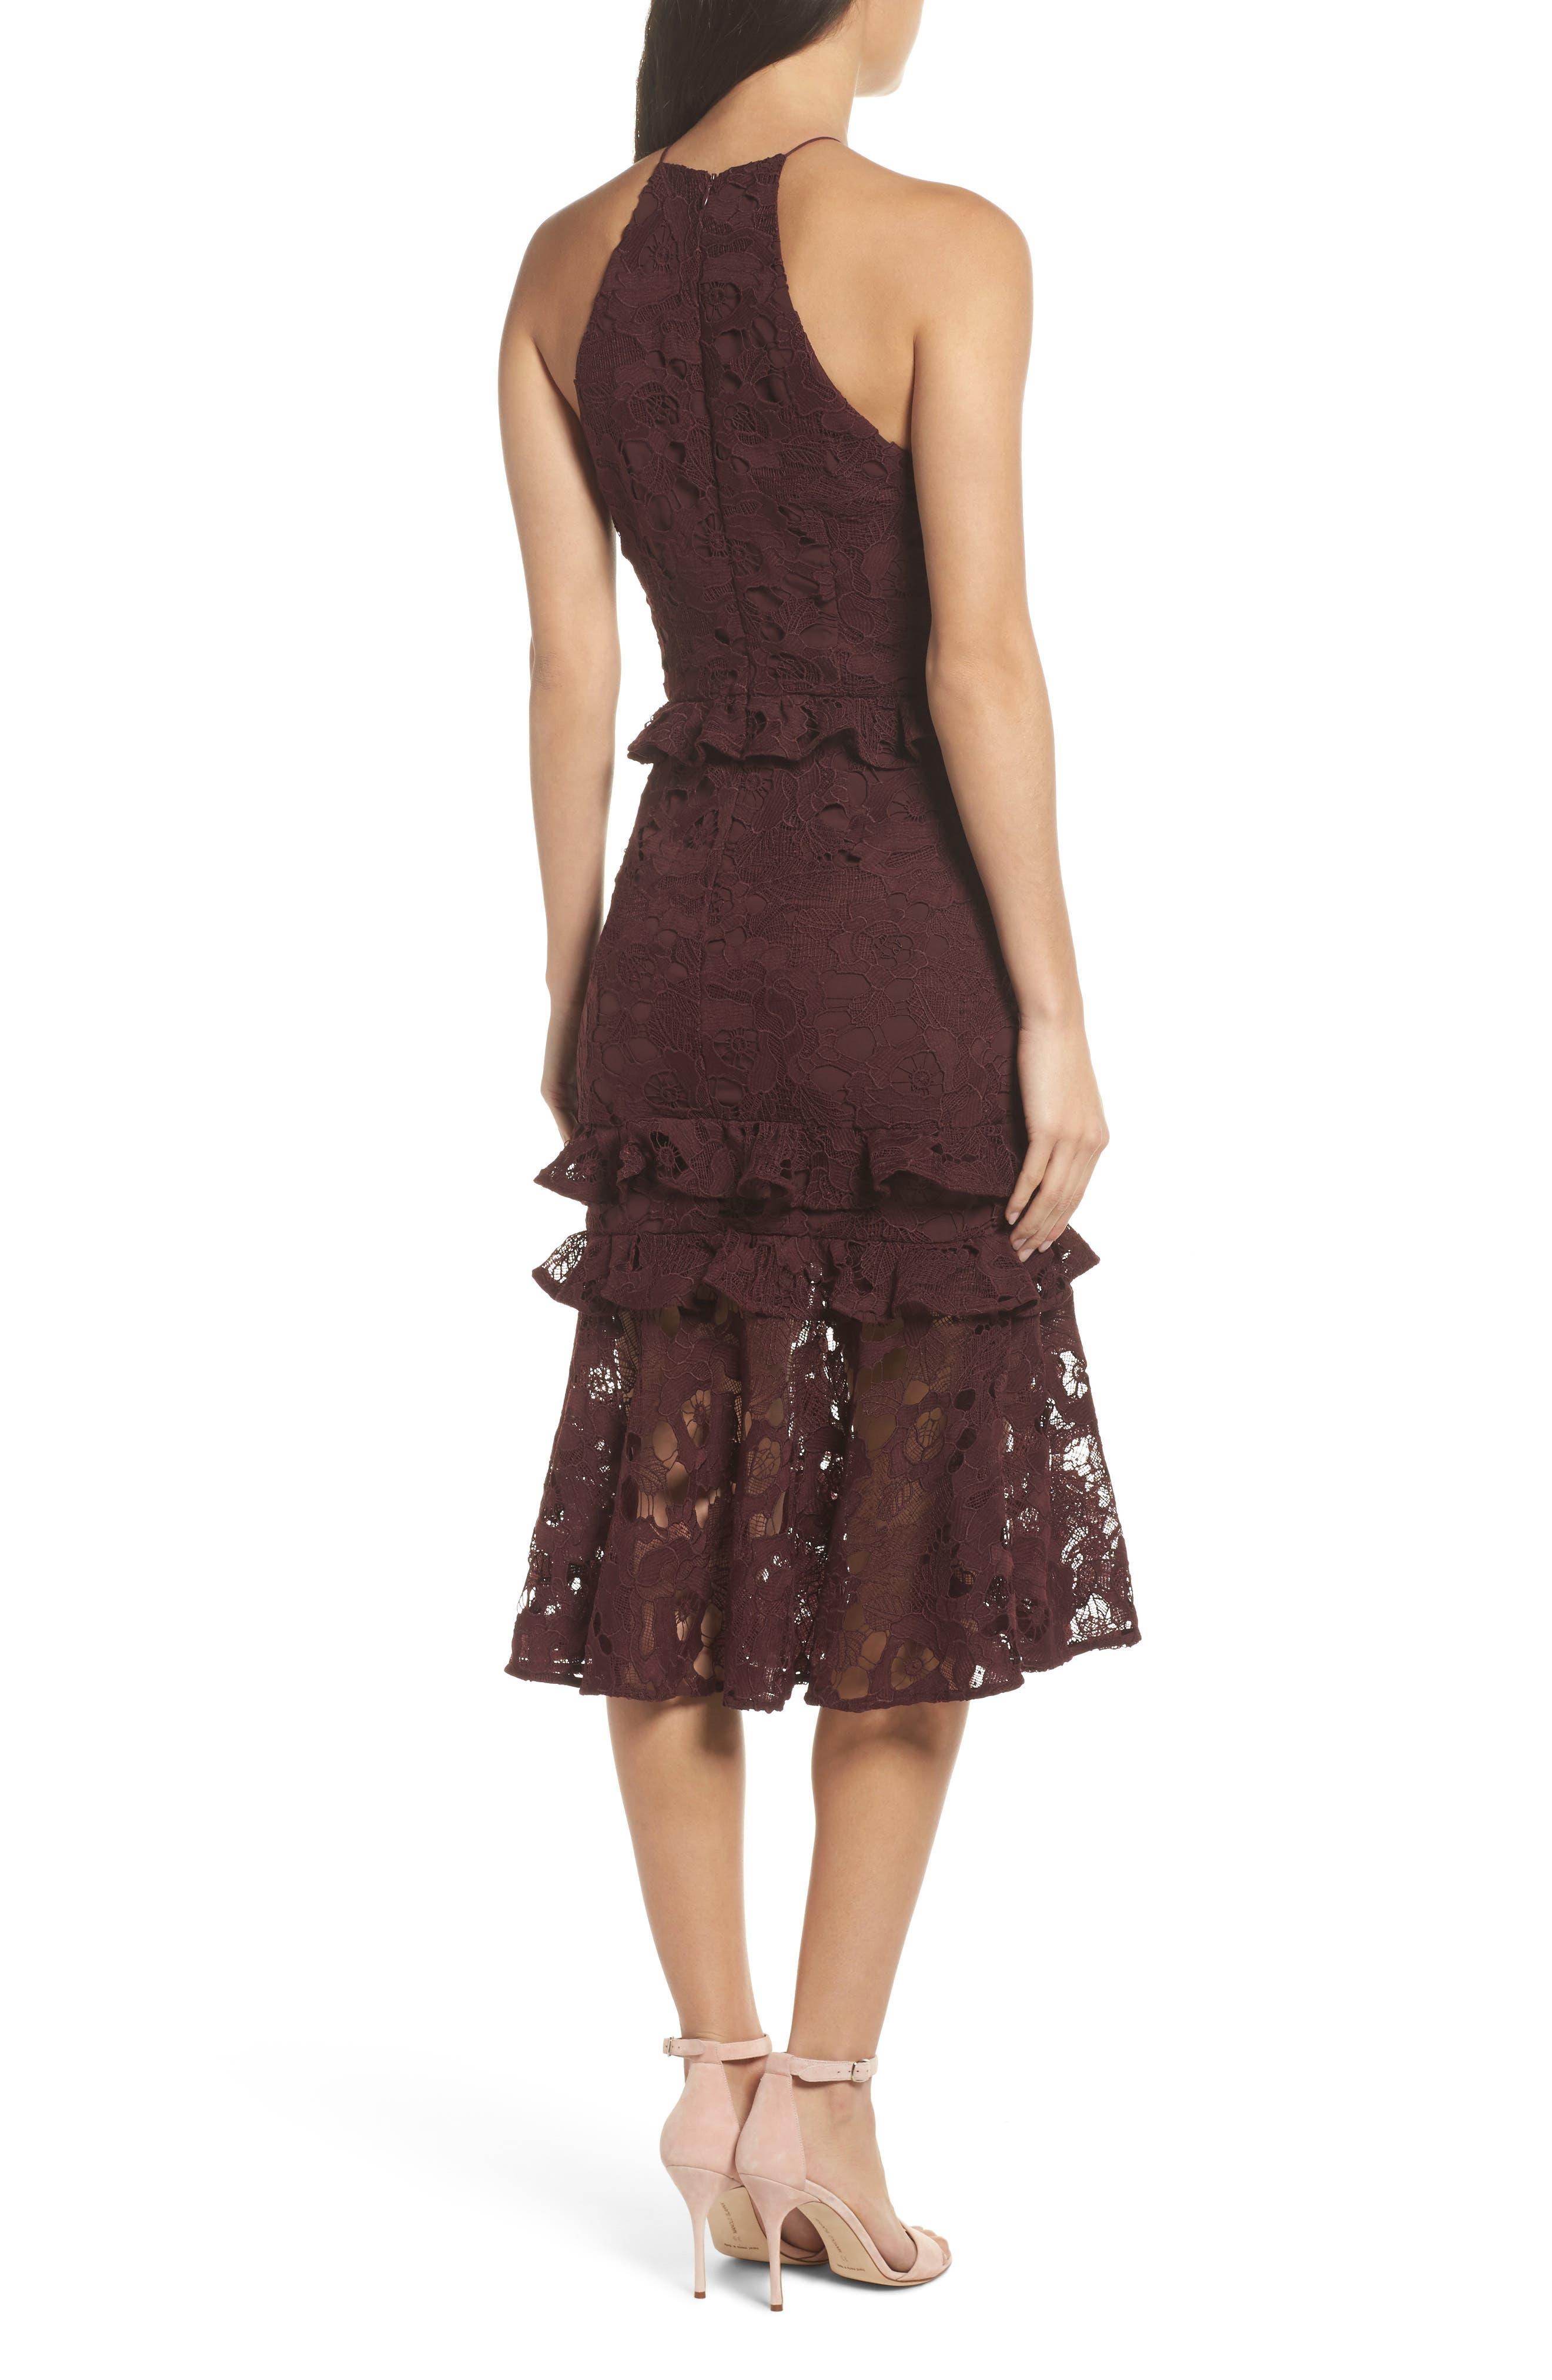 Enchantment Lace Midi Dress,                             Alternate thumbnail 2, color,                             930